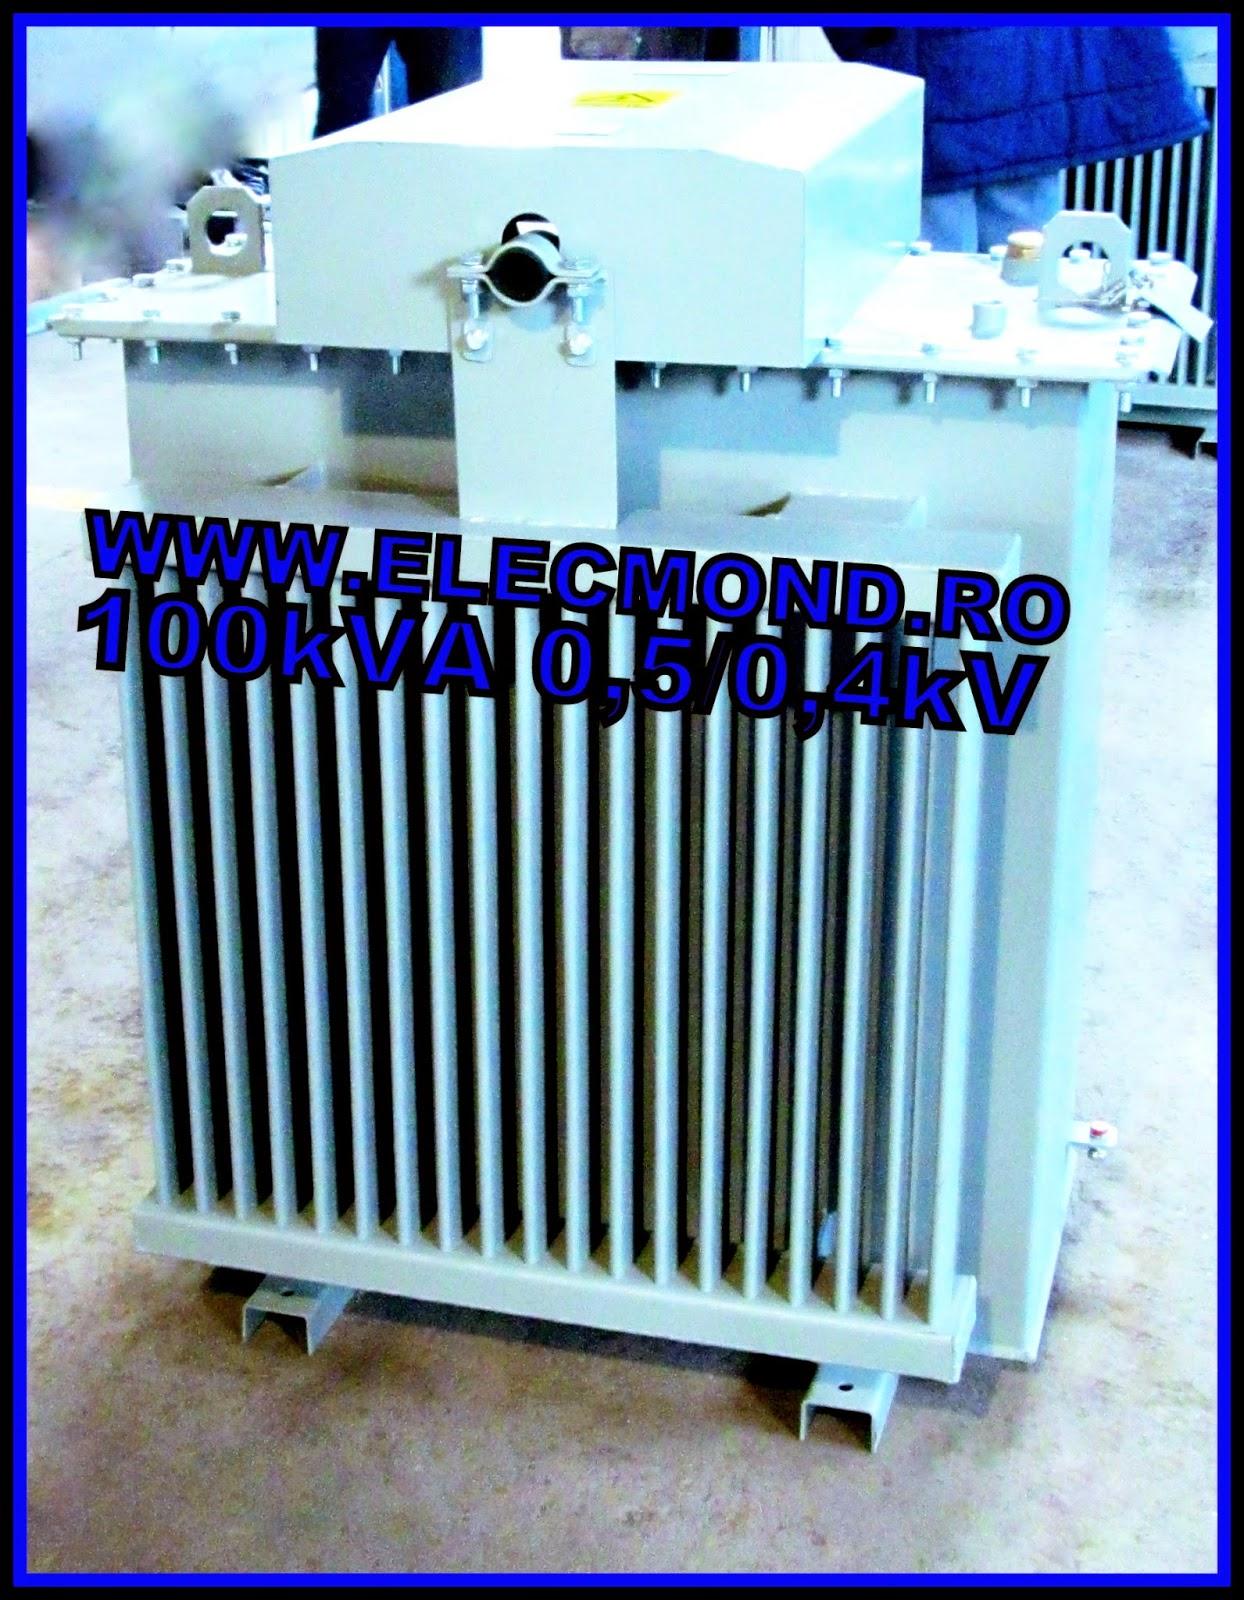 #Transformator 100kVA 0,5/0,4kV , #Transformatoare 100kVA 0,5/0,4kV , transformatoare speciale , transformatoare electrice , Elecmond , fabrica transformatoare , transformatoare in ulei